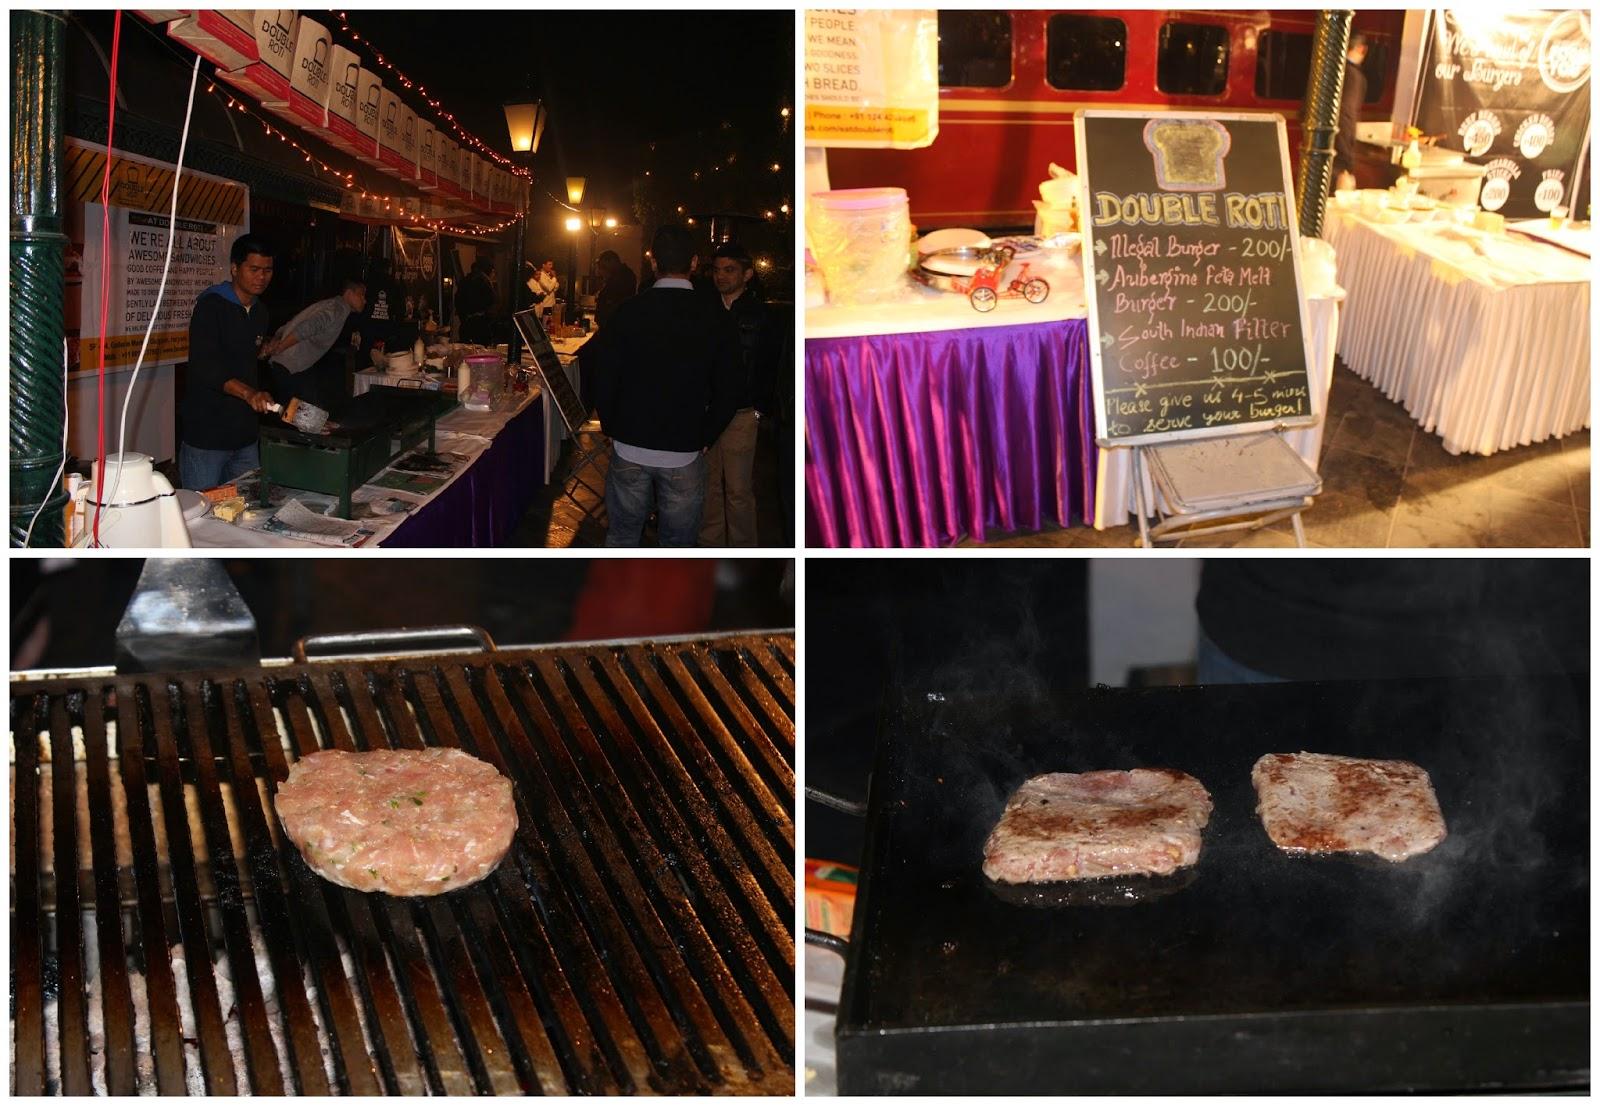 EatTreat Burger Faceoff, double roti, burger